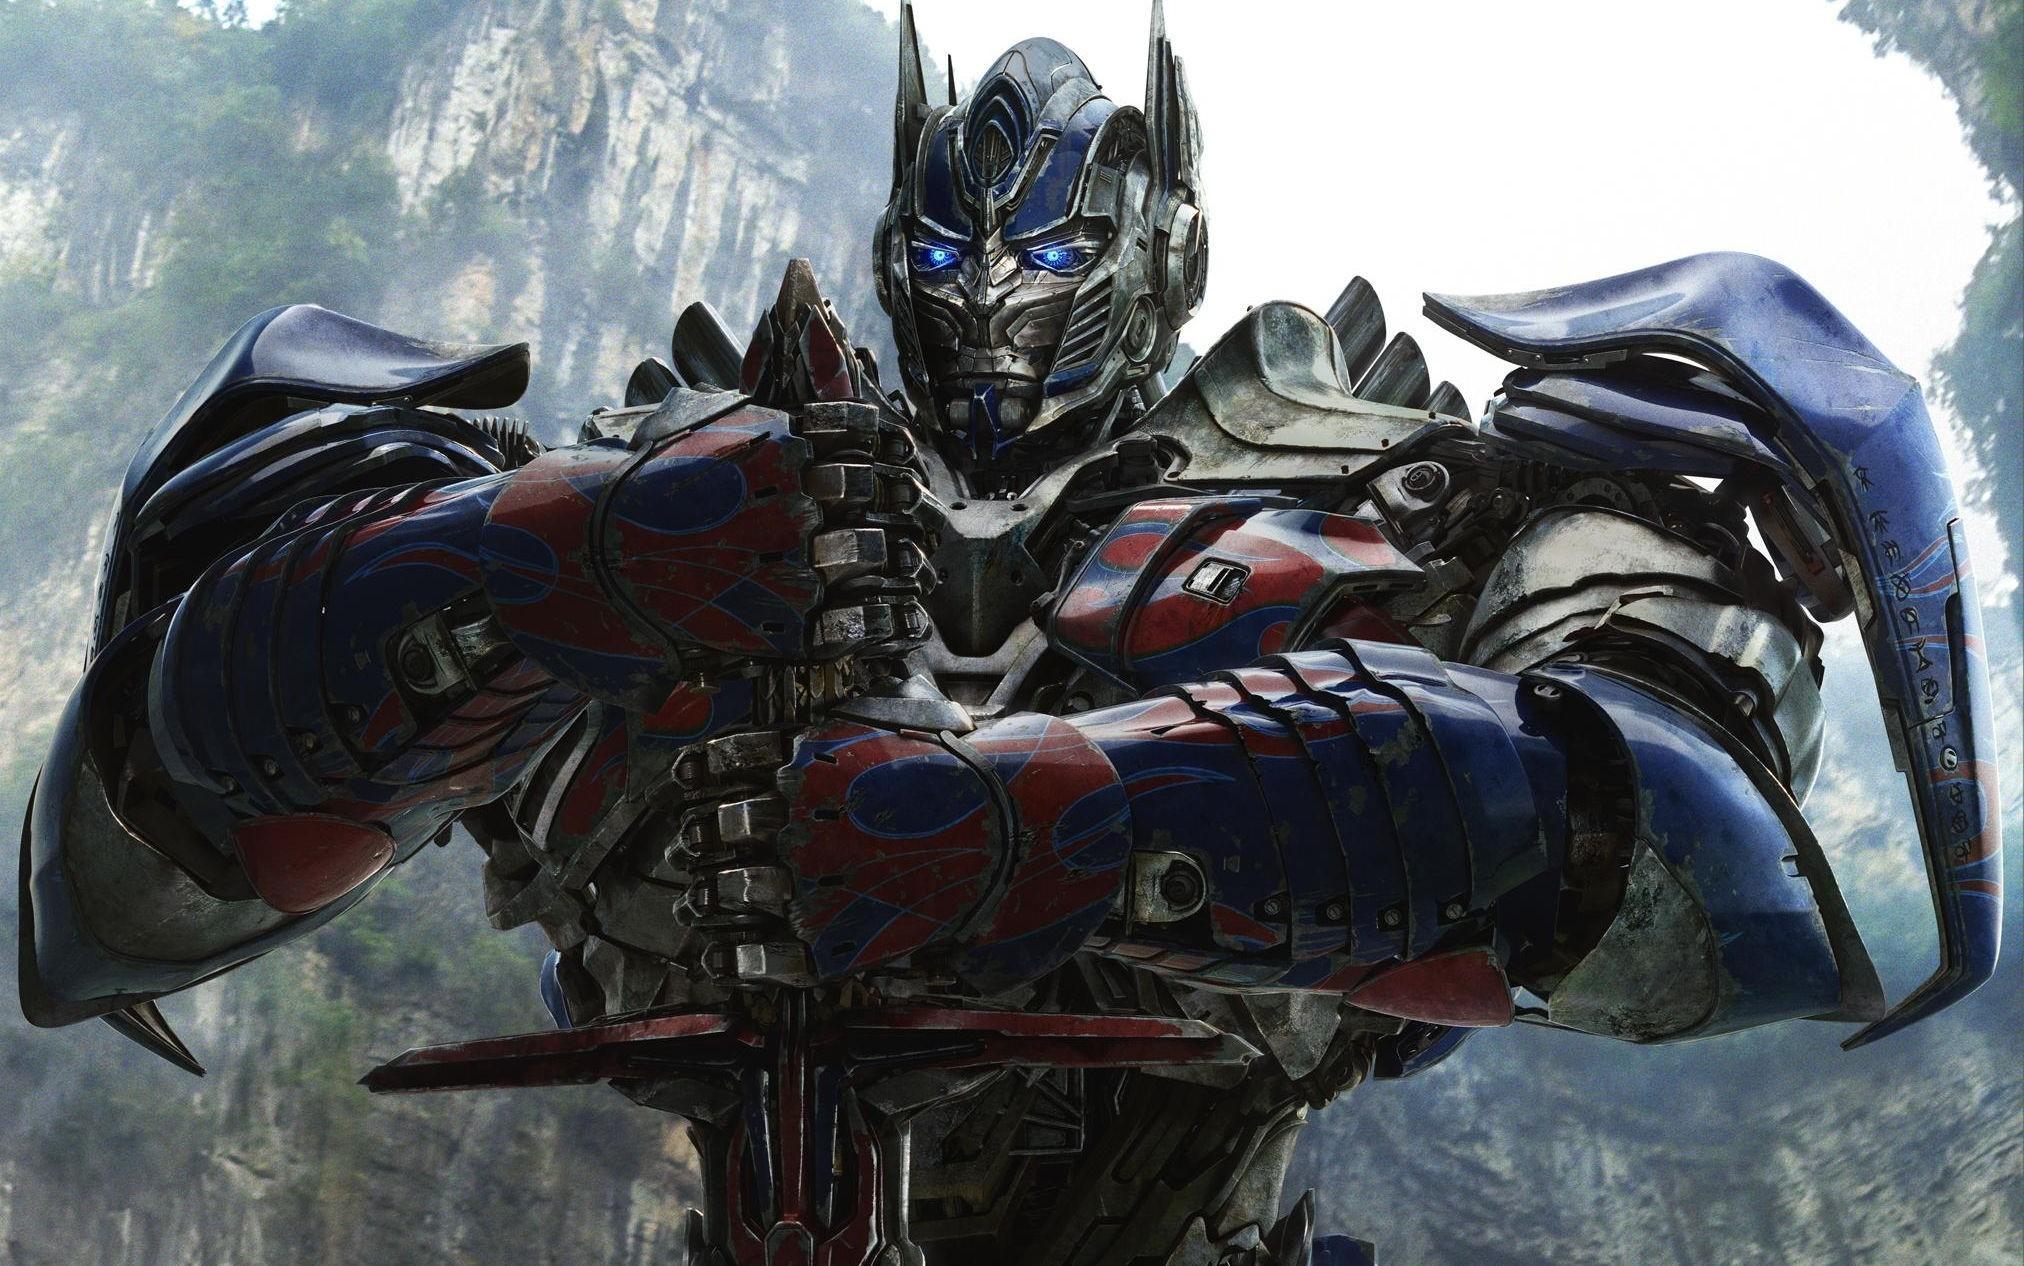 2024x1266, Optimus Prime, Transformers - Transformer Optimus Prime Hd - HD Wallpaper